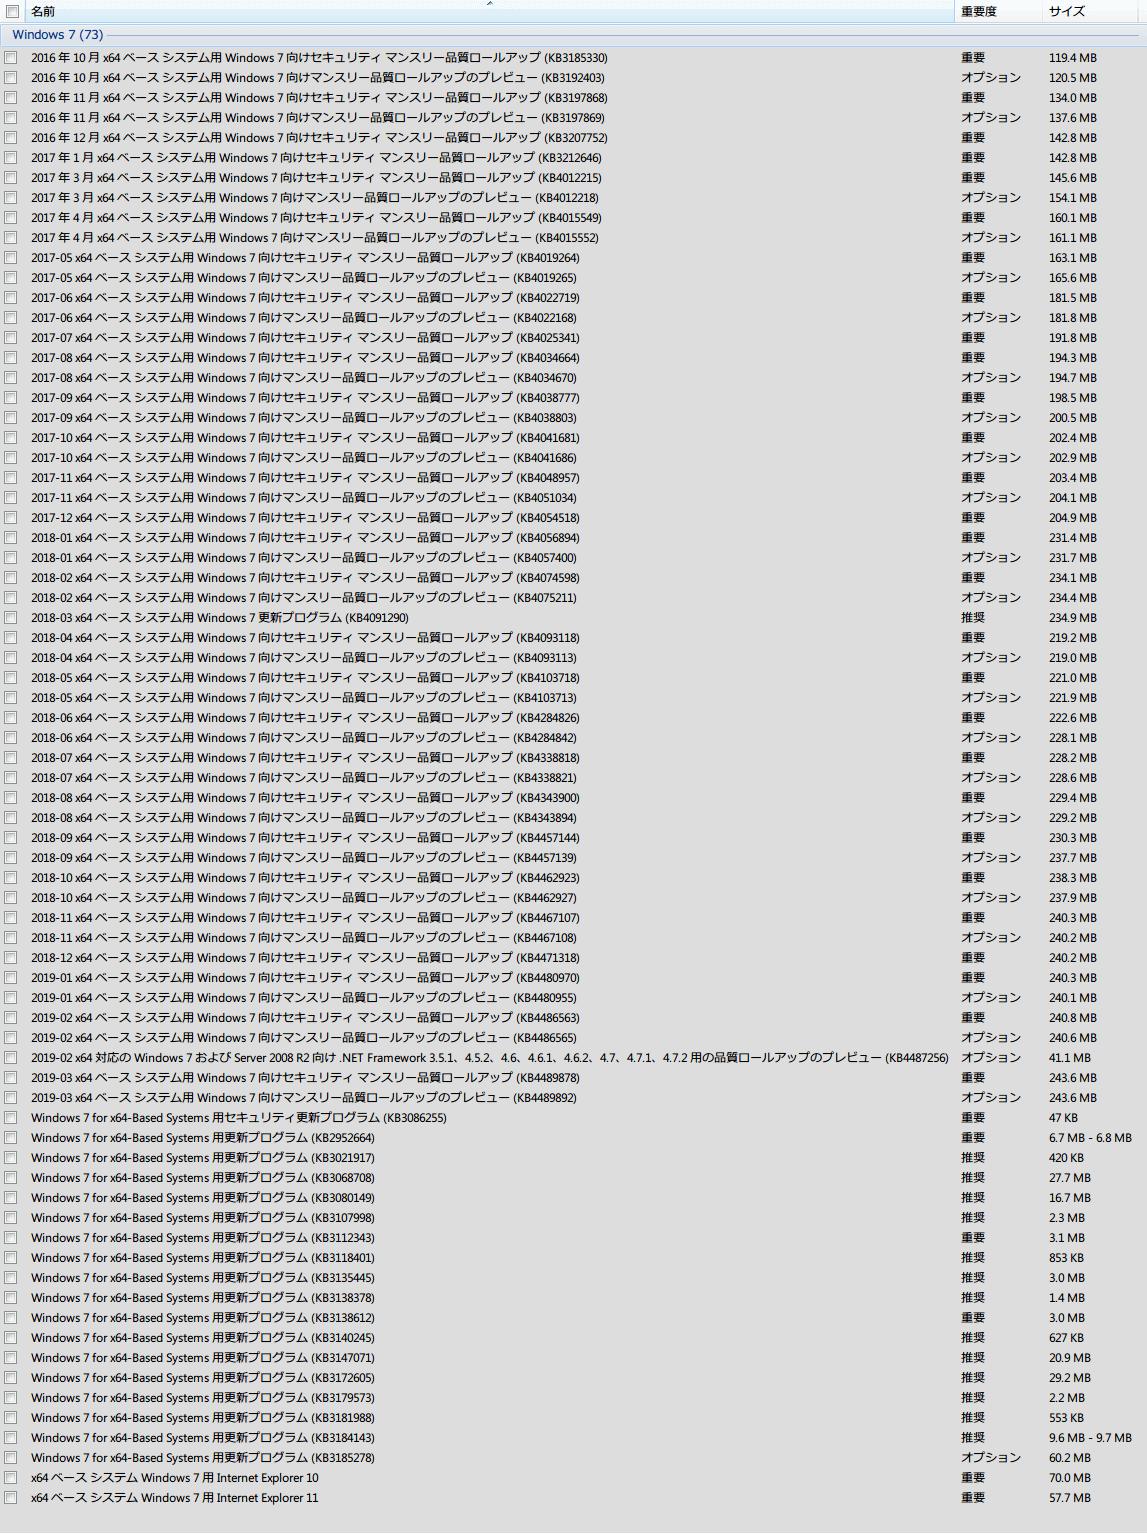 Windows 7 64bit Windows Update 2019年3月分まで非表示にした更新プログラムリスト